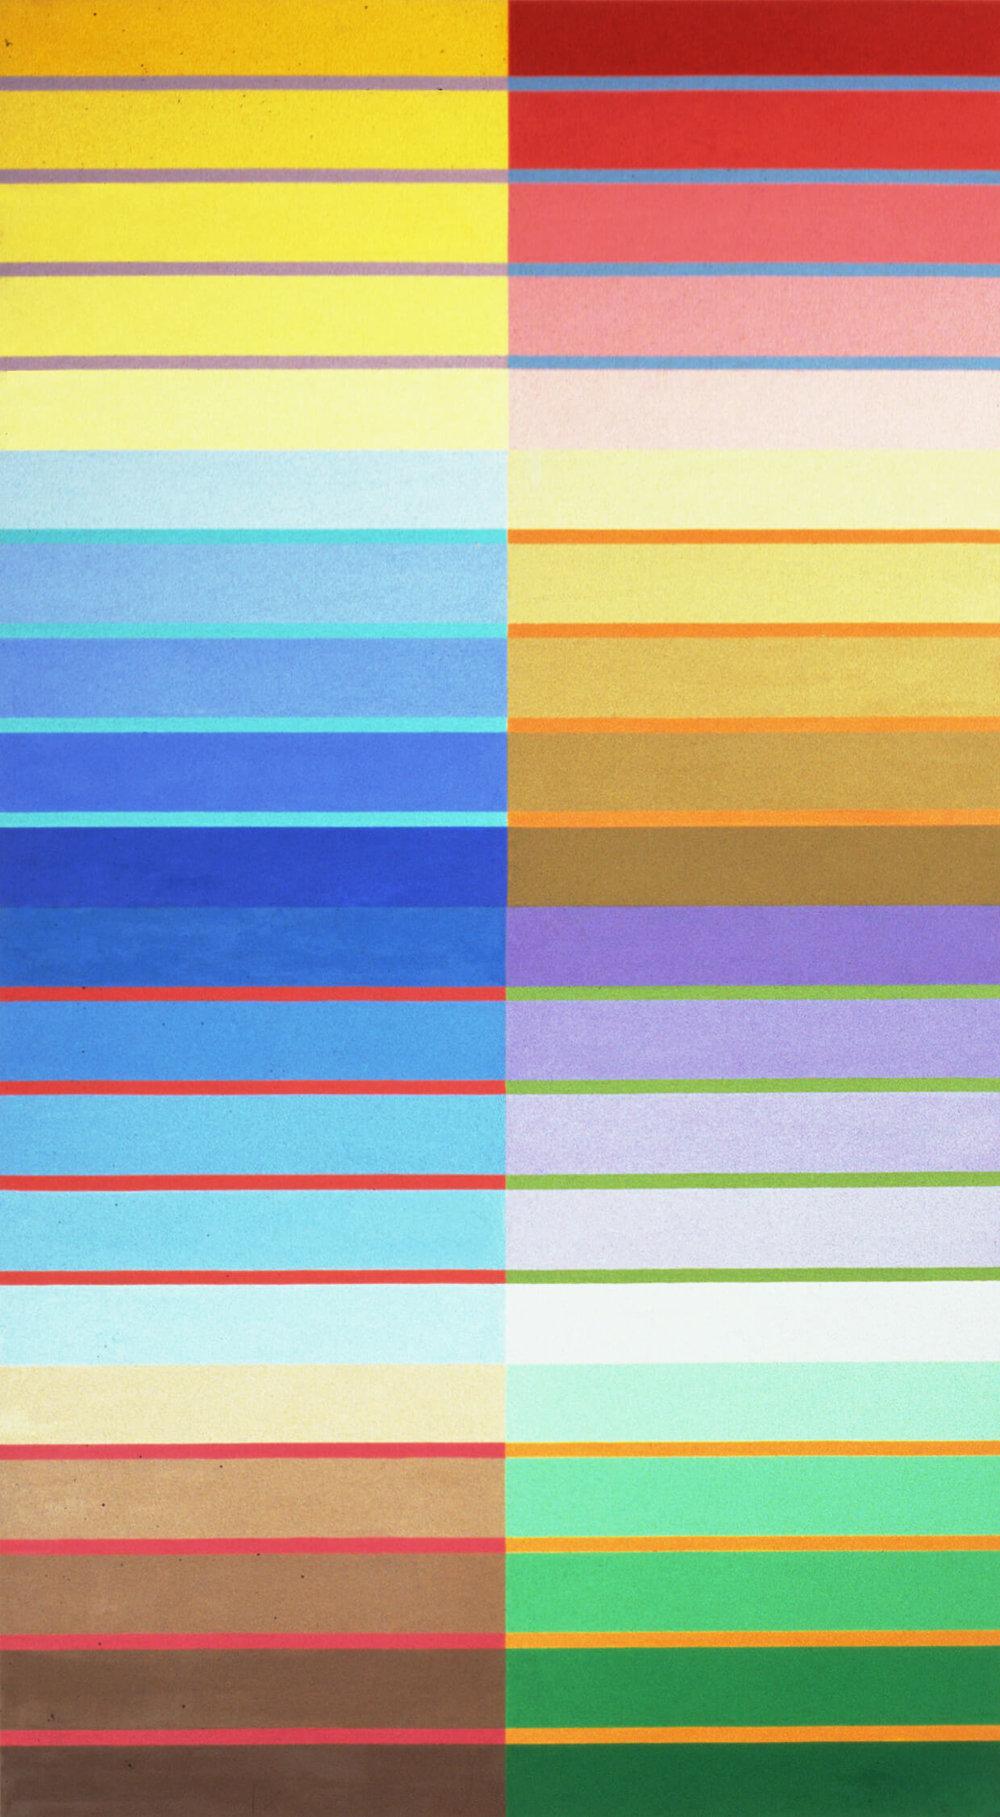 No title. Oil tempera on aluminum sheets, 234 x 132 cm, 2002